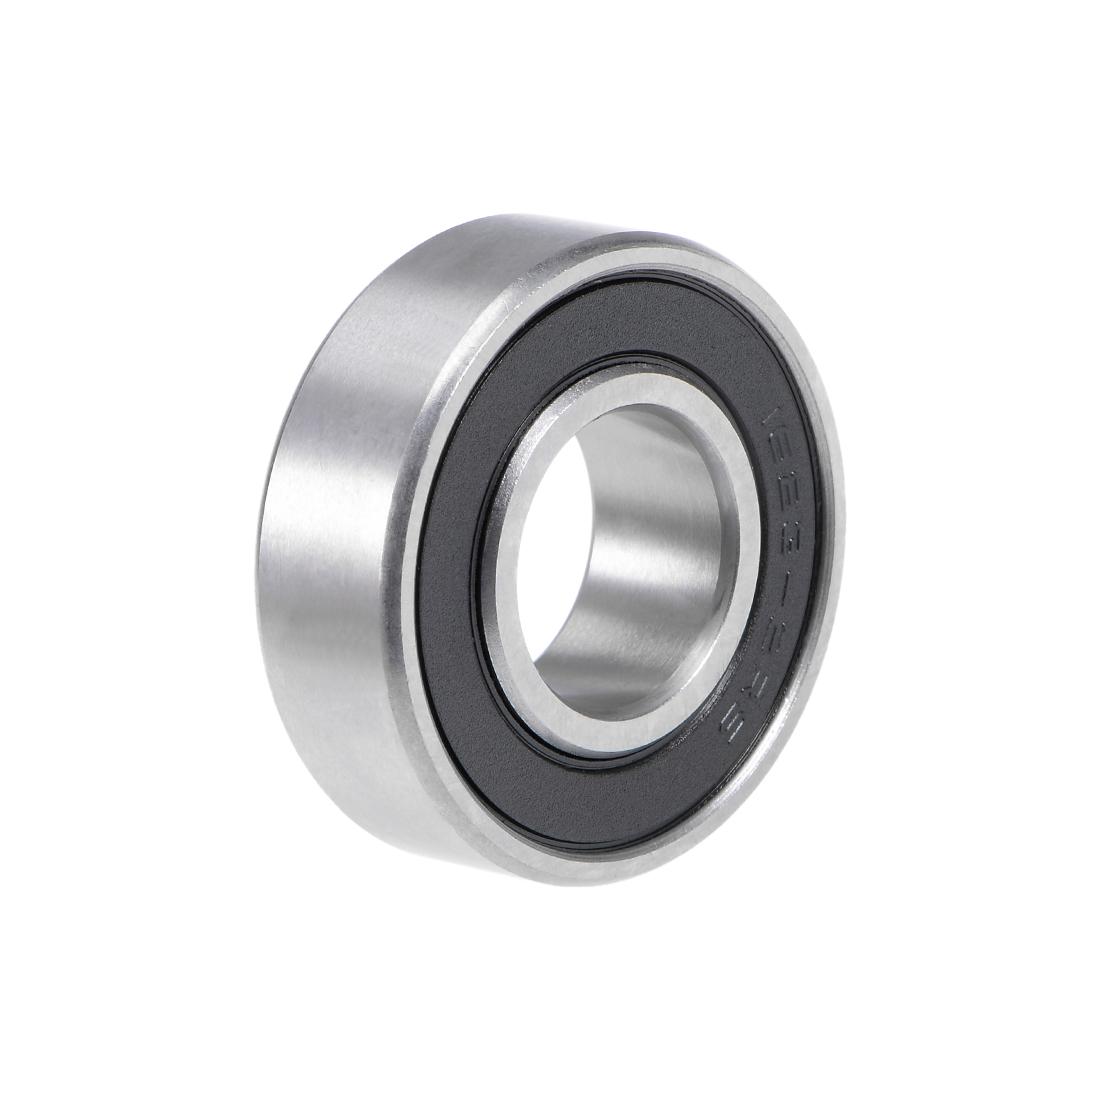 "1623-2RS Deep Groove Ball Bearing 5/8""x1-3/8""x7/16"" Shielded Chrome Z2 Bearings"